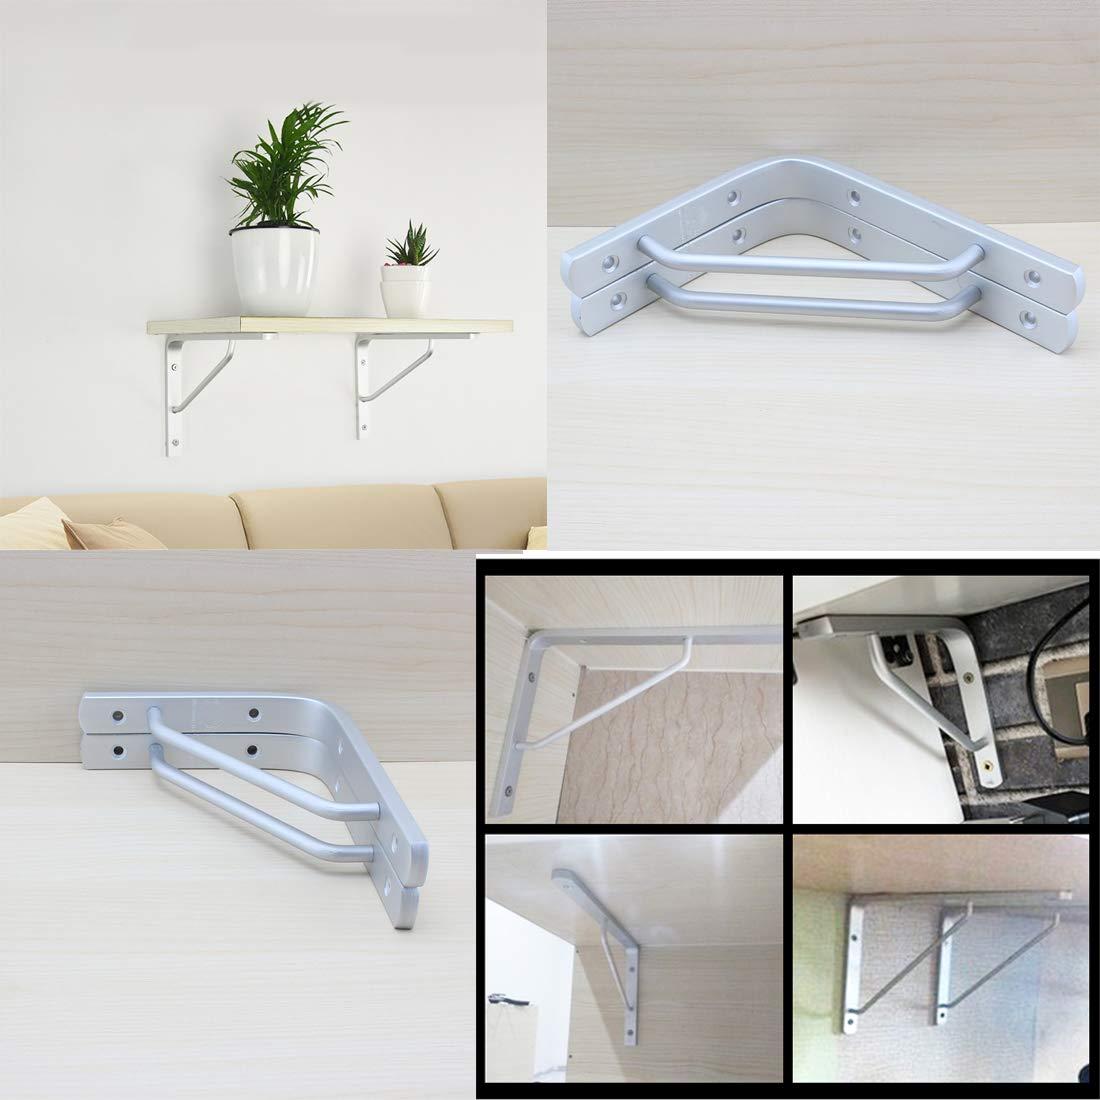 MoreShow 2 Pcs Aluminum Alloy Solid L Brackets,Shelf Support Corner Brace Joint Right Angle Bracket for Office Home Garden,Right Angle Bracket,L Shaped Bracket,Angle Brace(8''X6'')